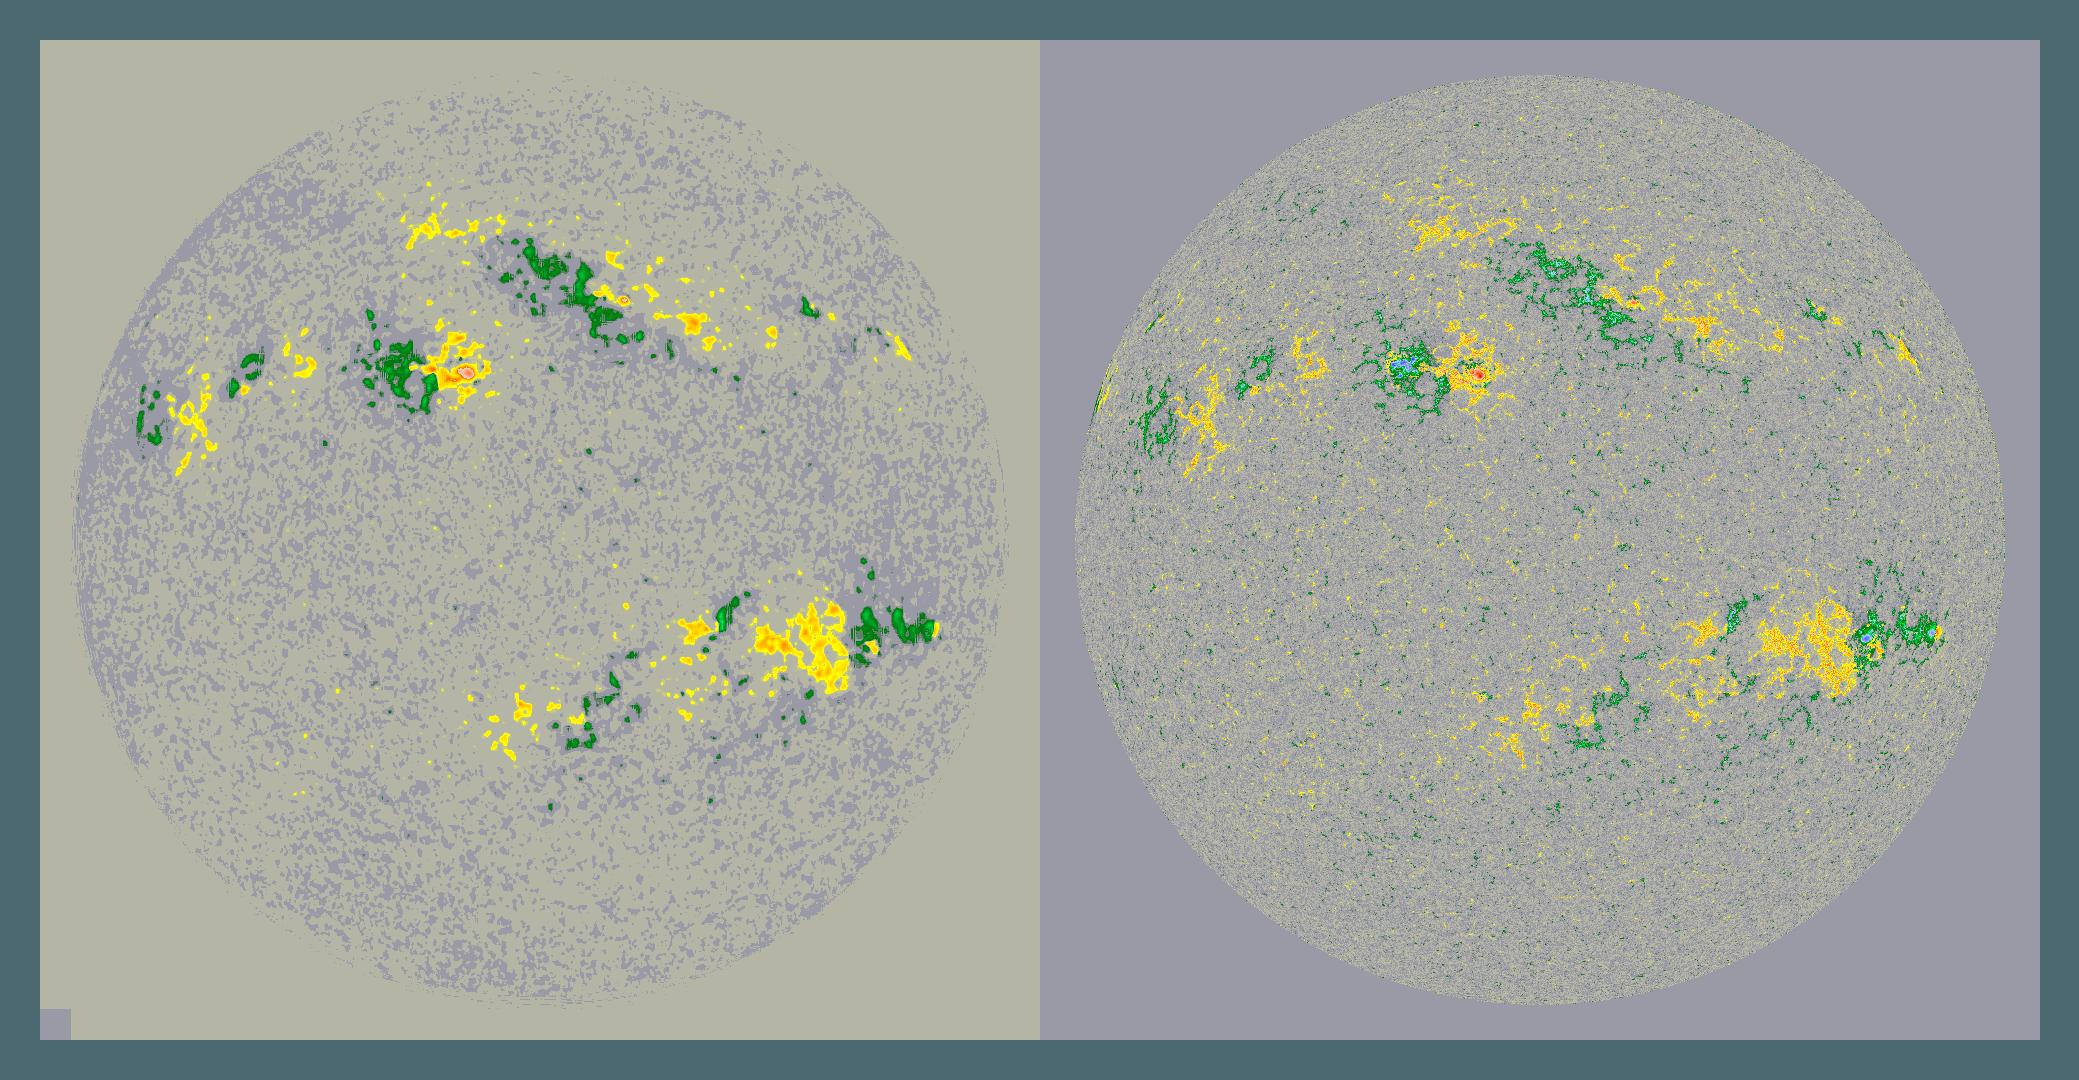 Figure 5: Result of a cross-instrument magnetogram image conversion